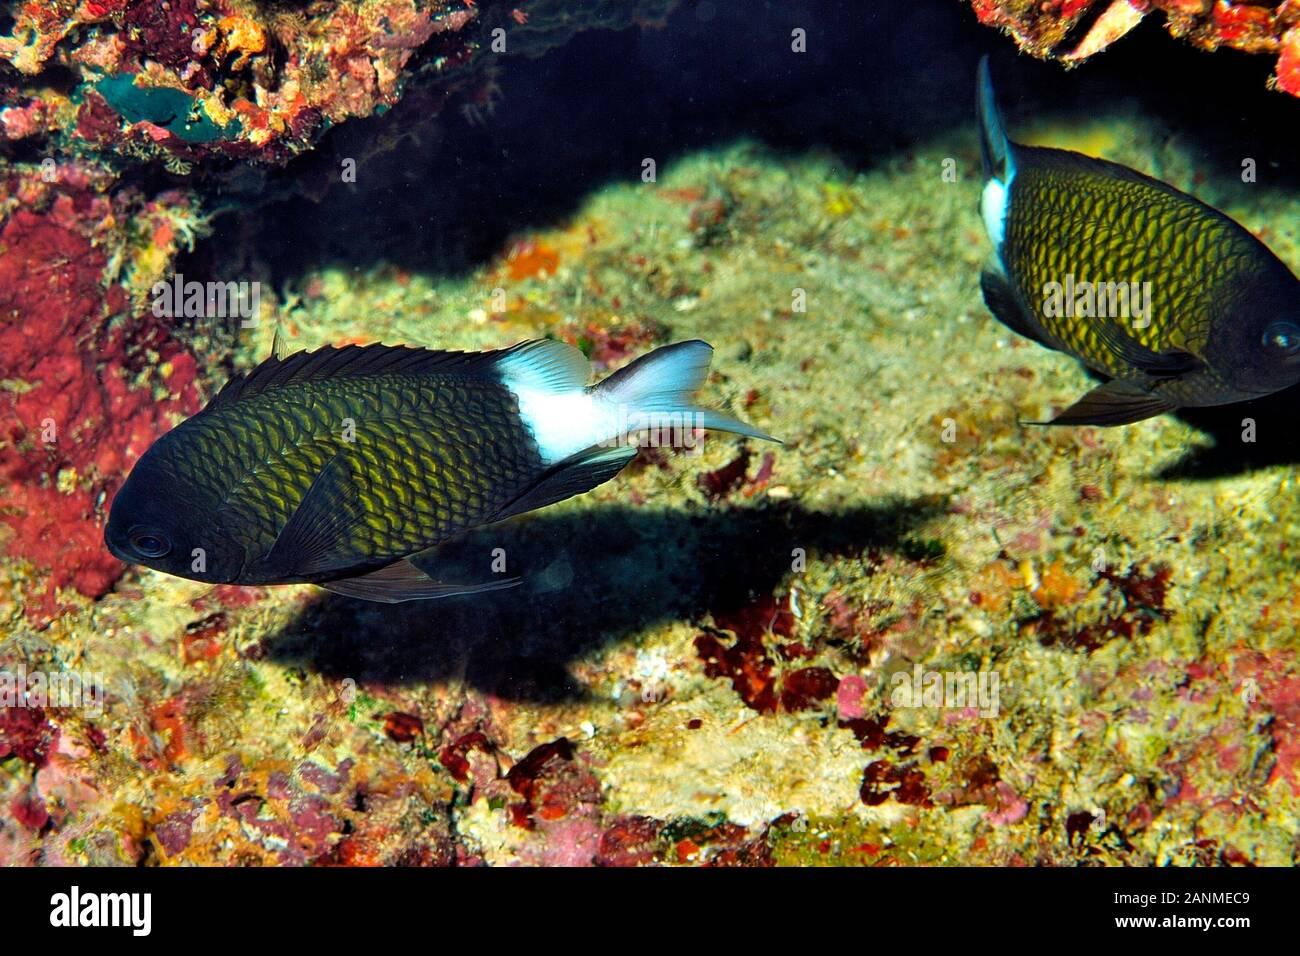 Speckled-Fin Damselfish,  'Pomacentrus Nagasakeiensis', Maede Cape, Onna, Okinawa, Ryukyu Islands, Japan Stock Photo